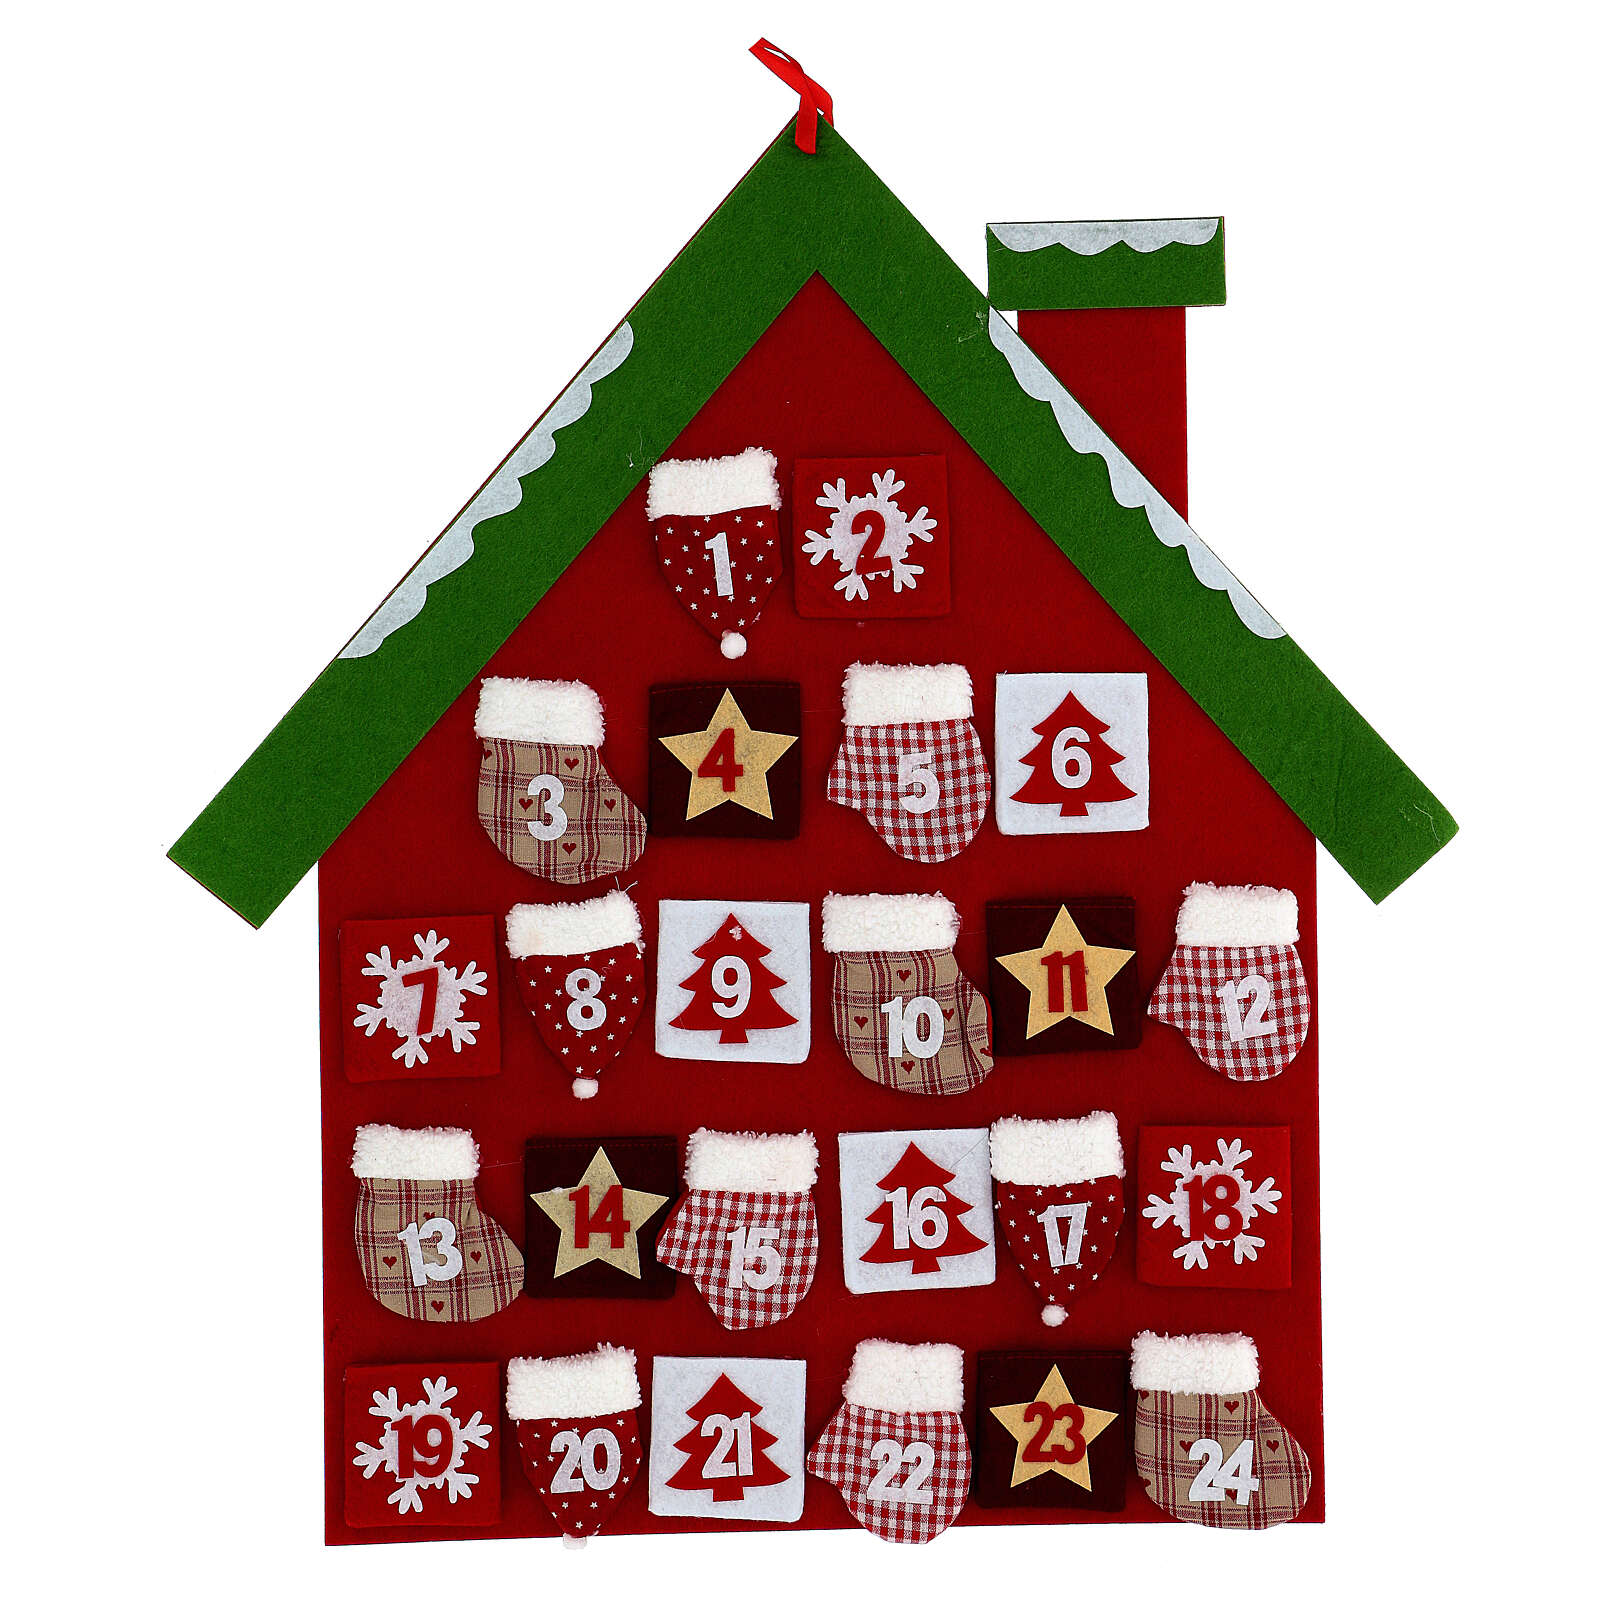 Calendrier Avent maison rouge tissu 3